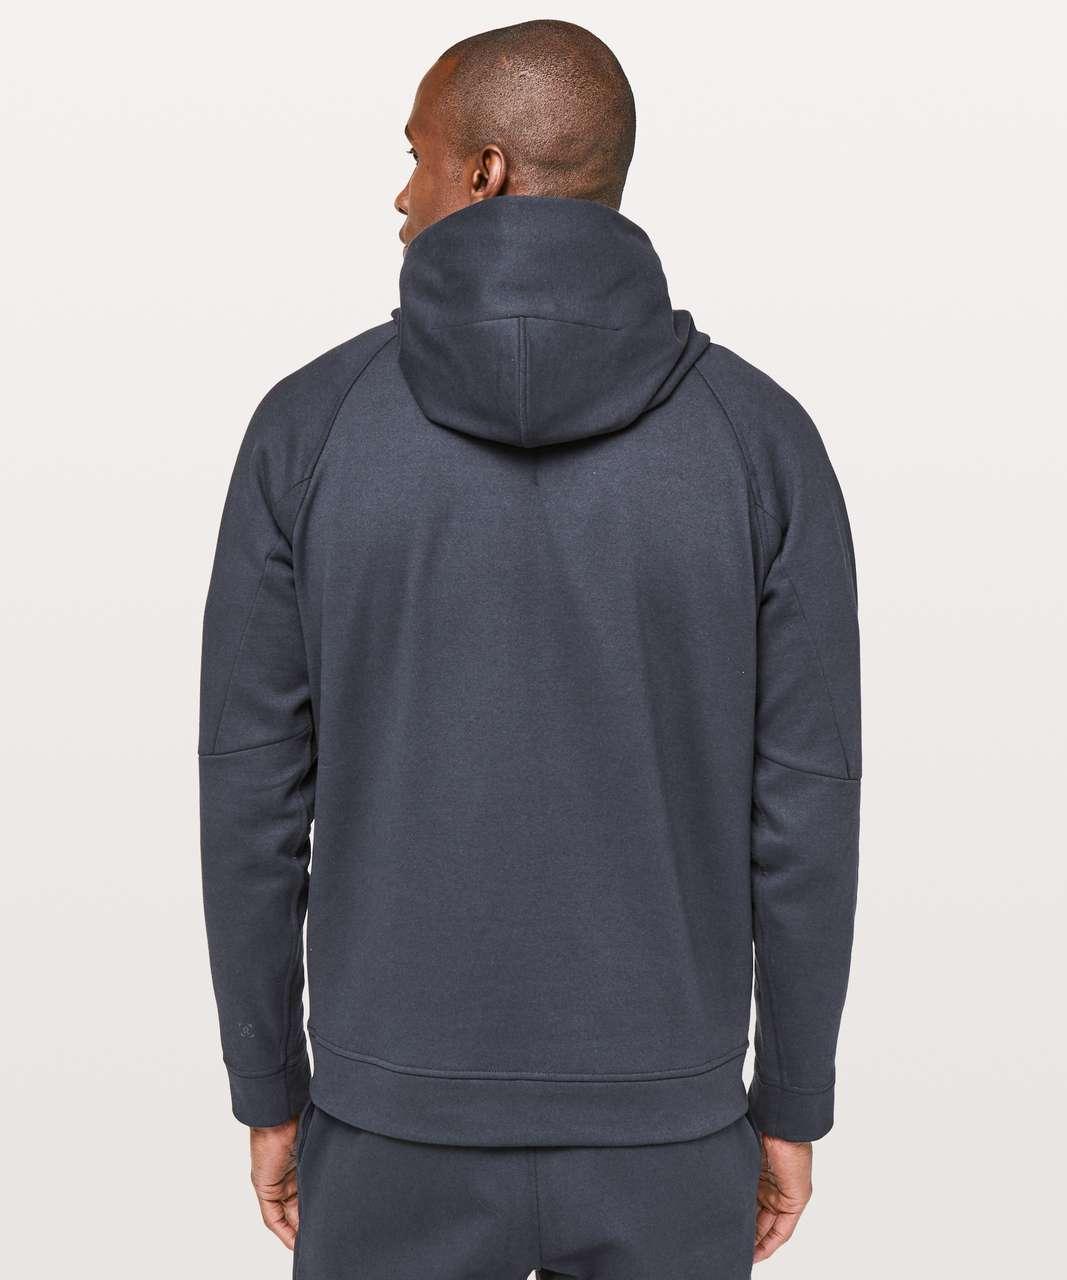 Lululemon City Sweat Pullover Hoodie *Thermo - Heathered Nautical Navy